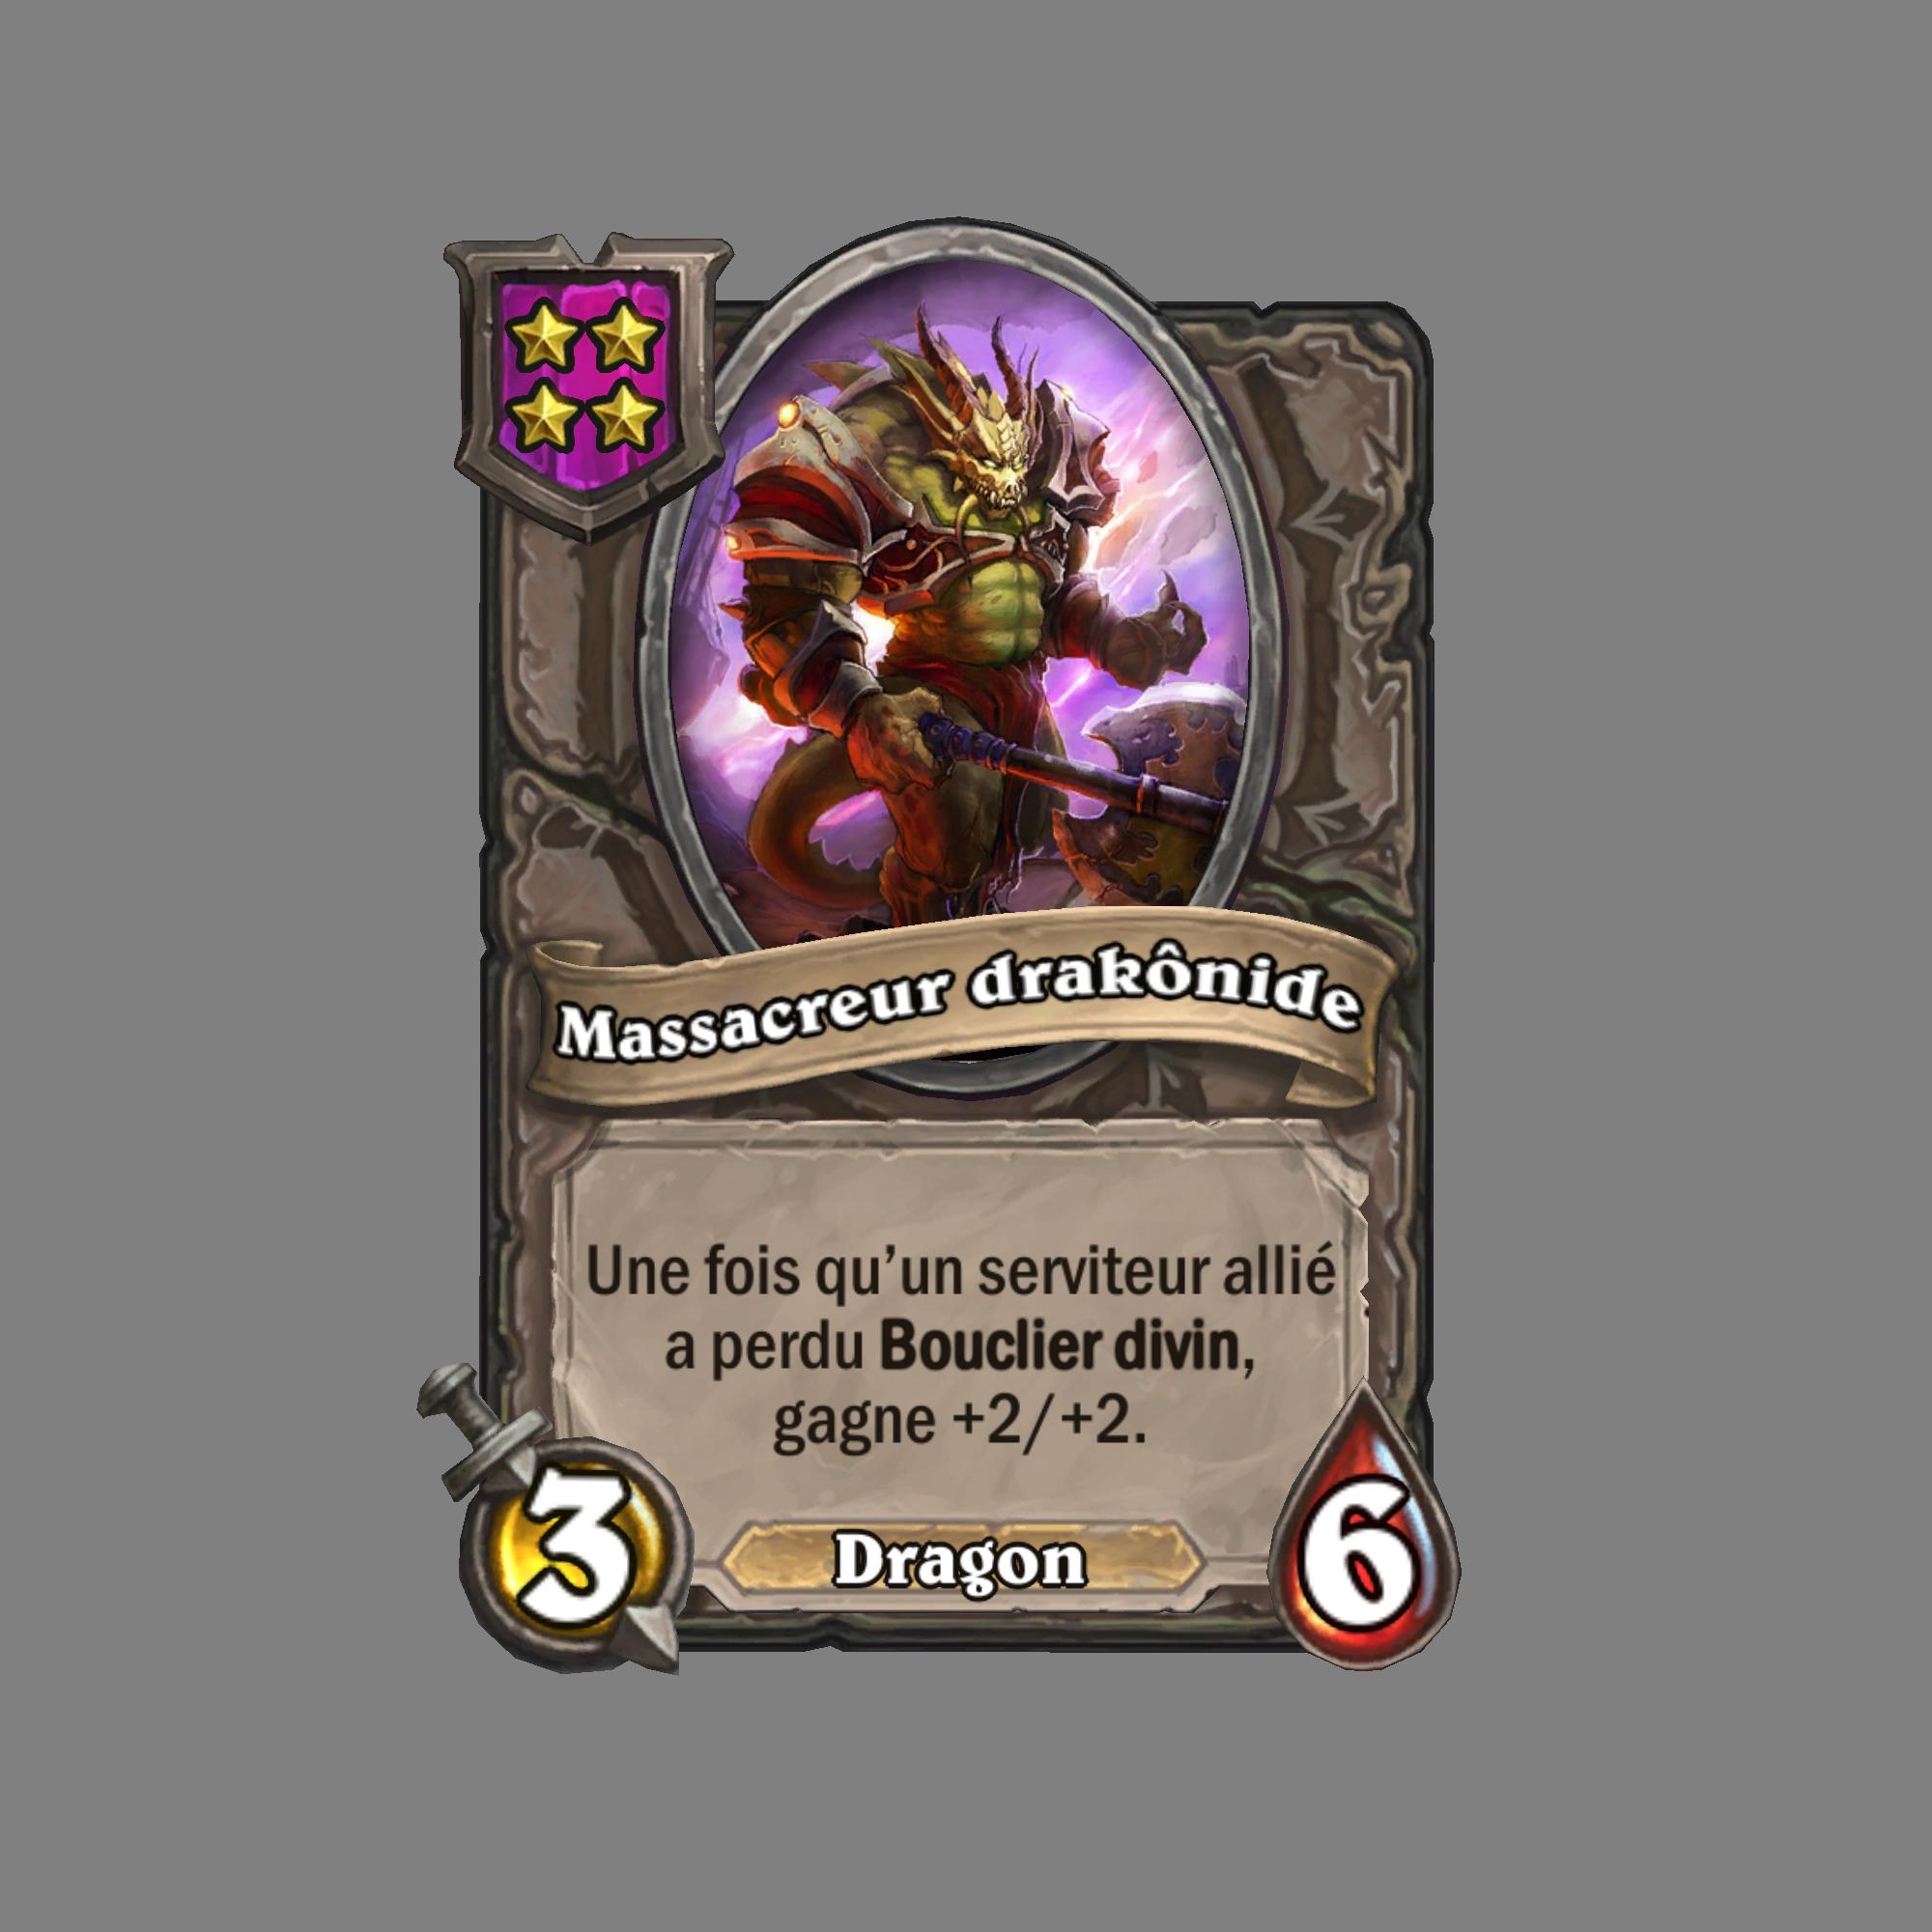 Massacreur drakônide